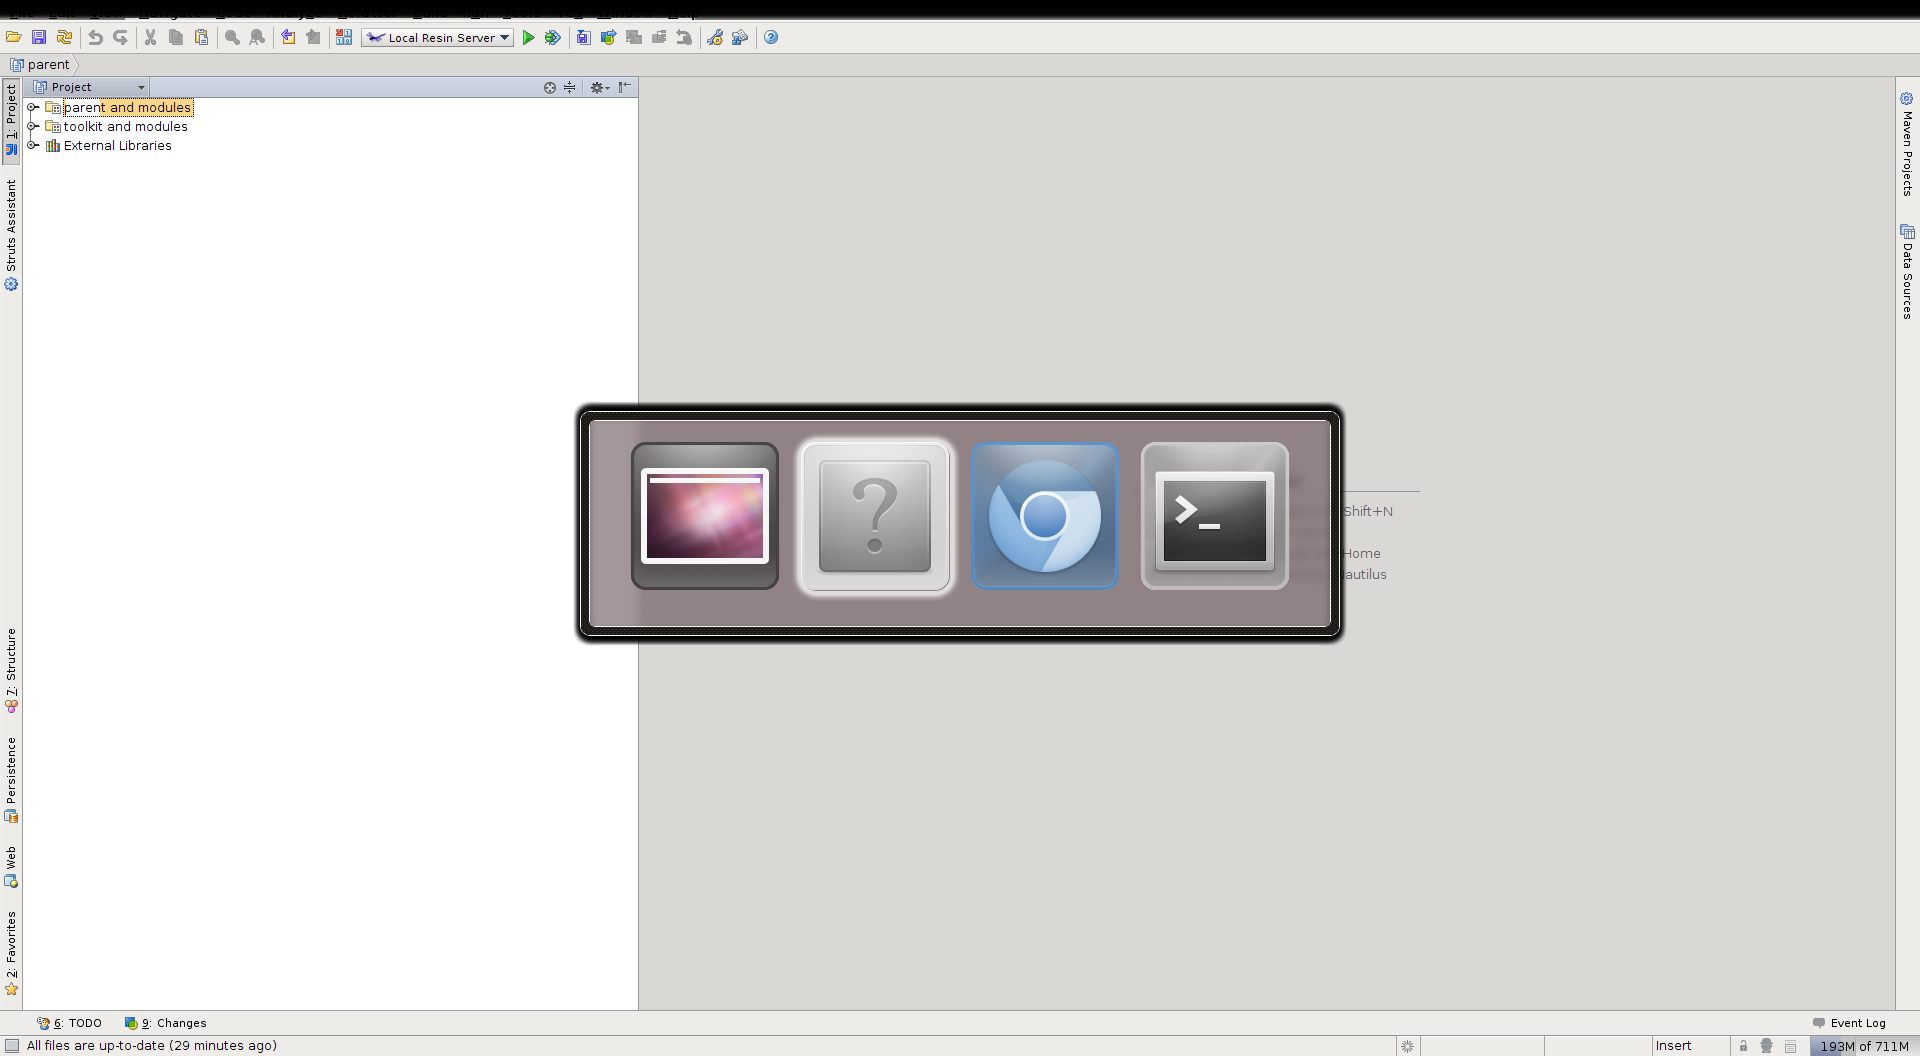 intellij-missing-icon-in-ubuntu-switcher.png